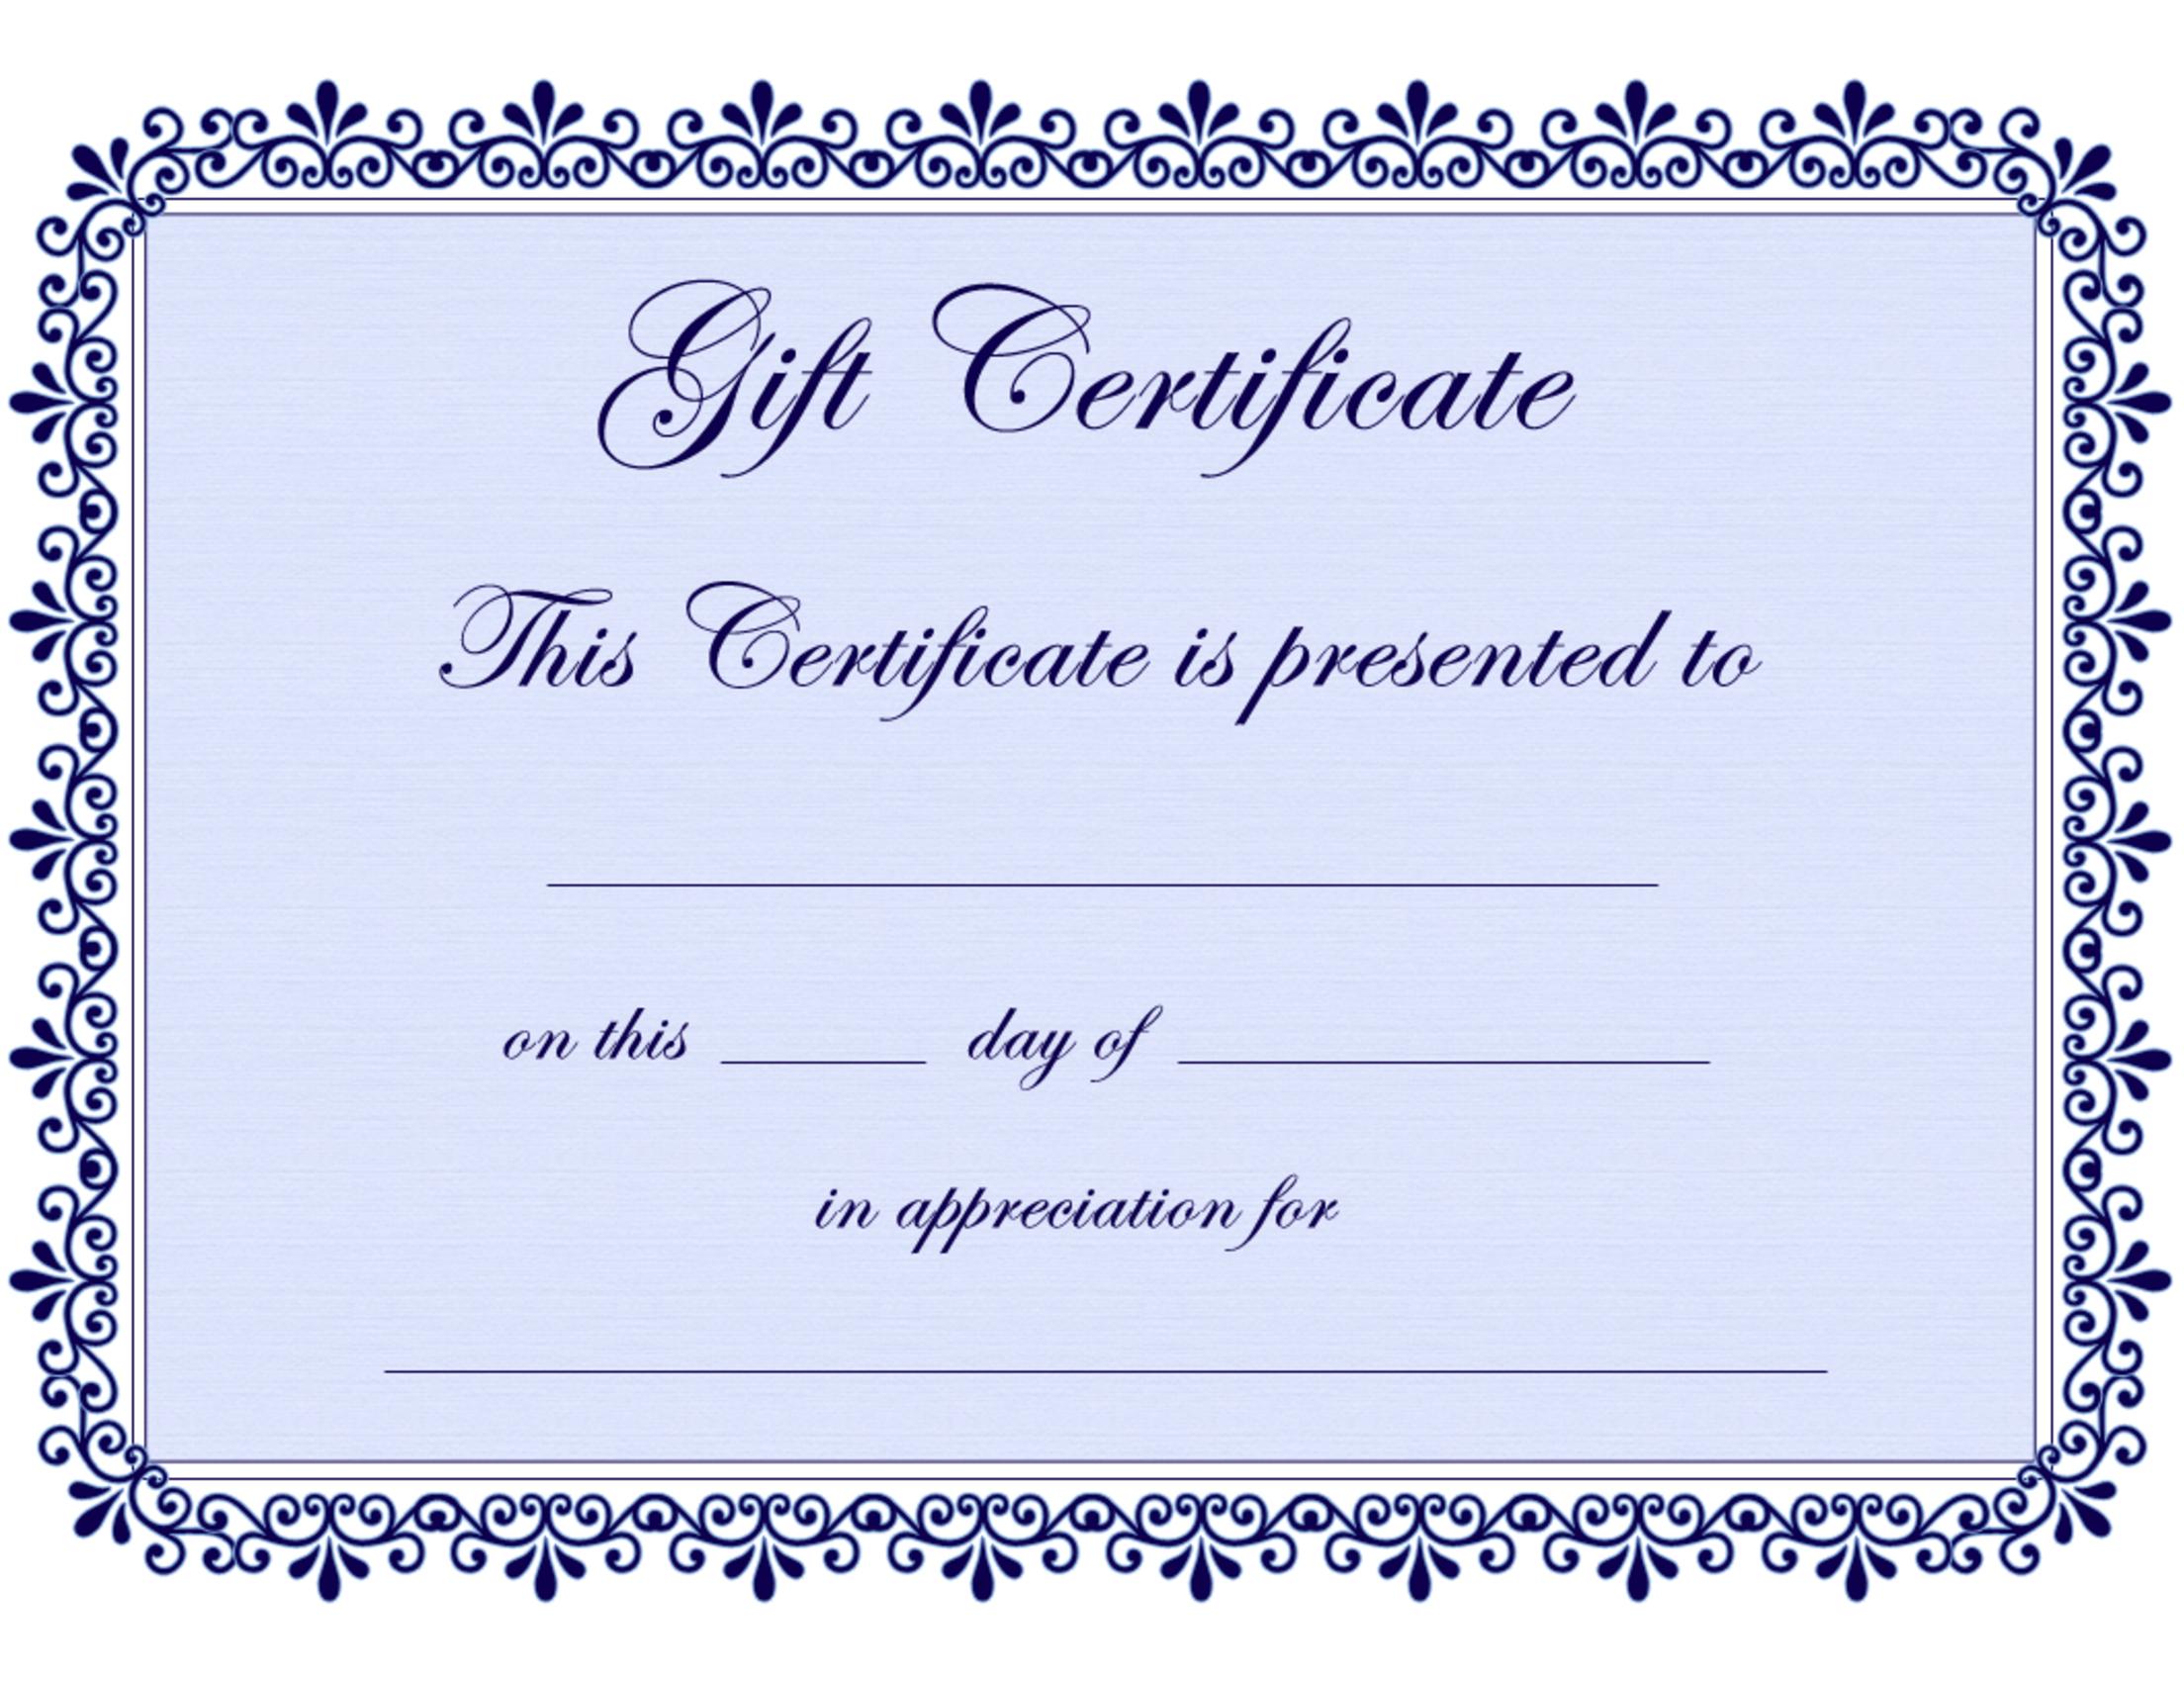 Certificate Templates   Gift Certificate Template Free - Pdf - Free Printable Tattoo Gift Certificates